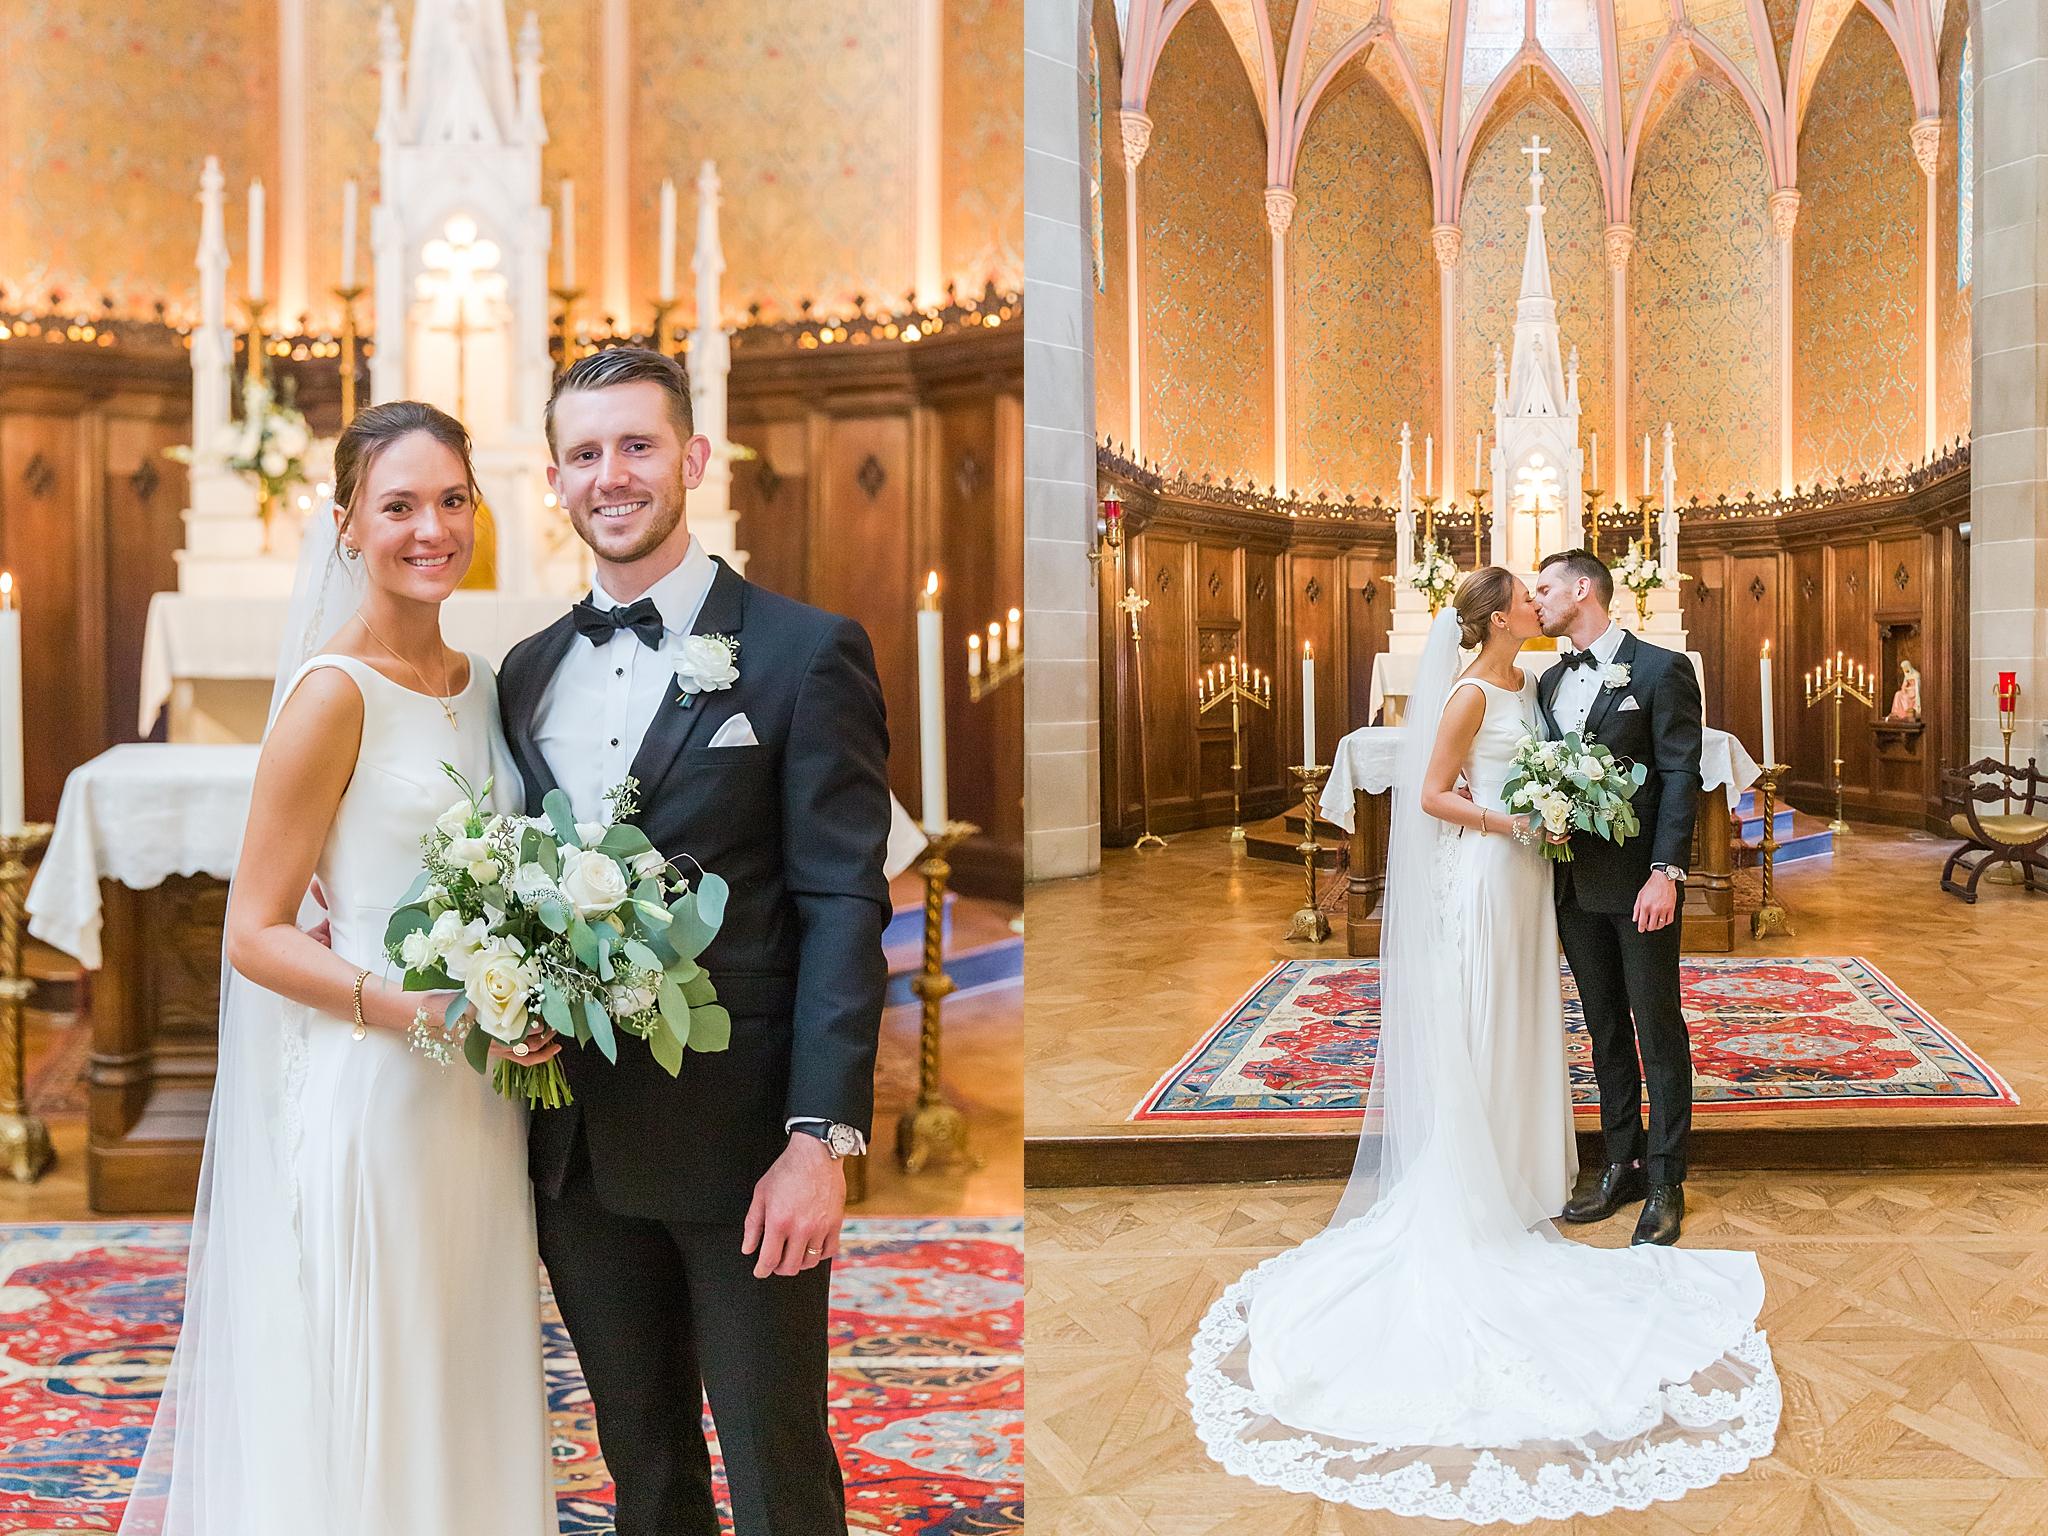 detroit-wedding-photographer-grosse-pointe-academy-chapel-detroit-golf-club-wedding-carly-matt-by-courtney-carolyn-photography_0061.jpg